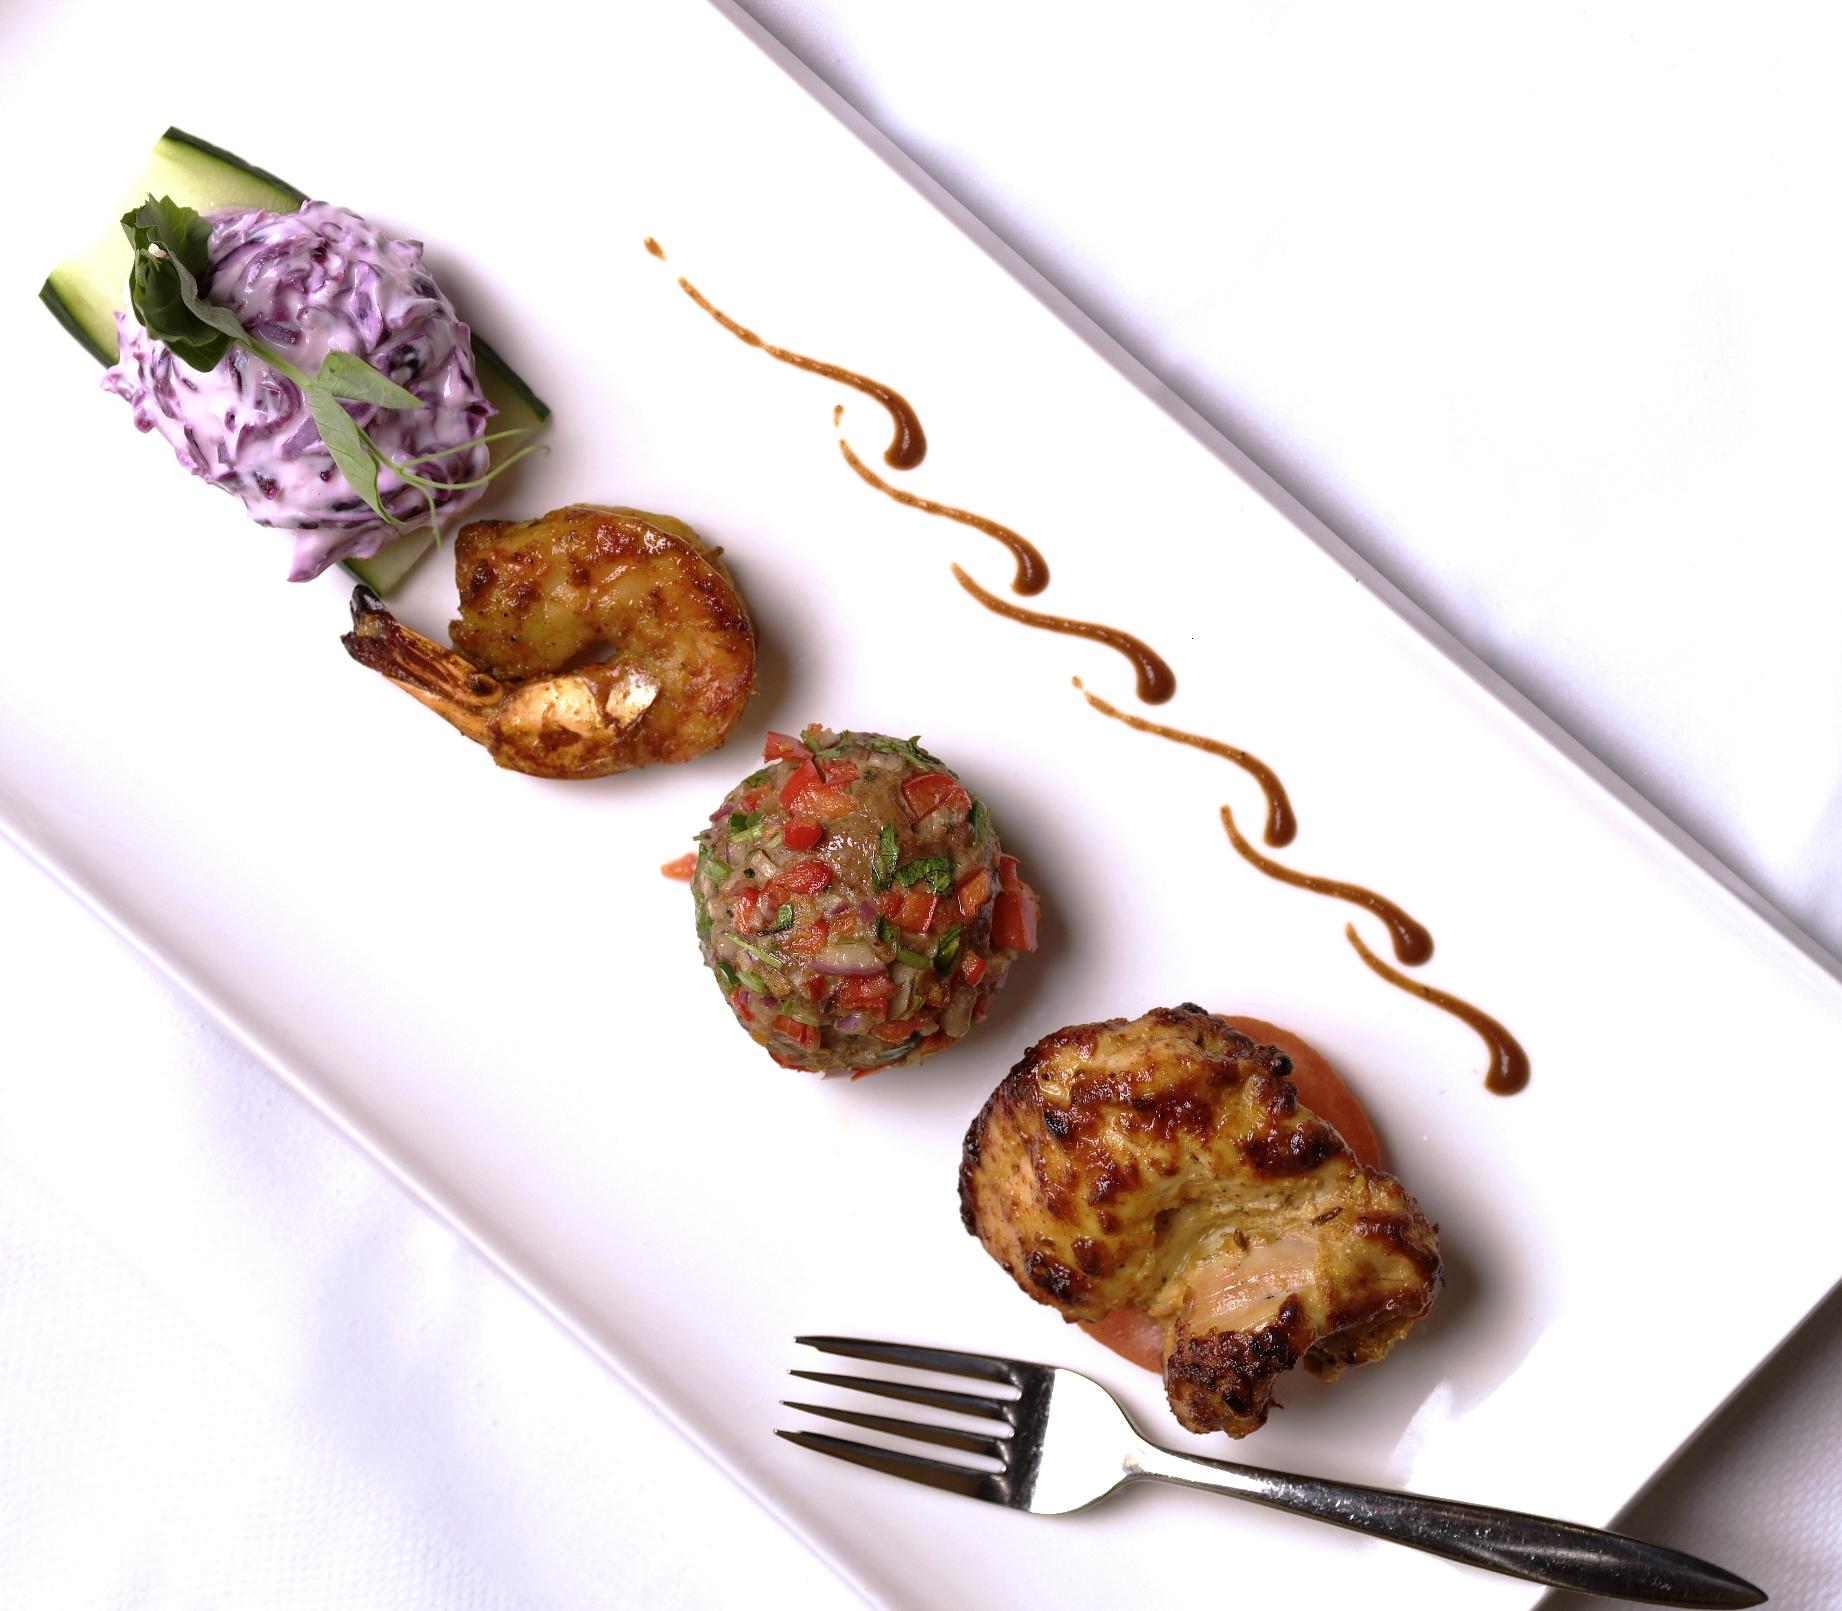 Origin India kebab platter of tiger prawn, organic chicken breast and paneer cheese tikka and lamb kebab - resized